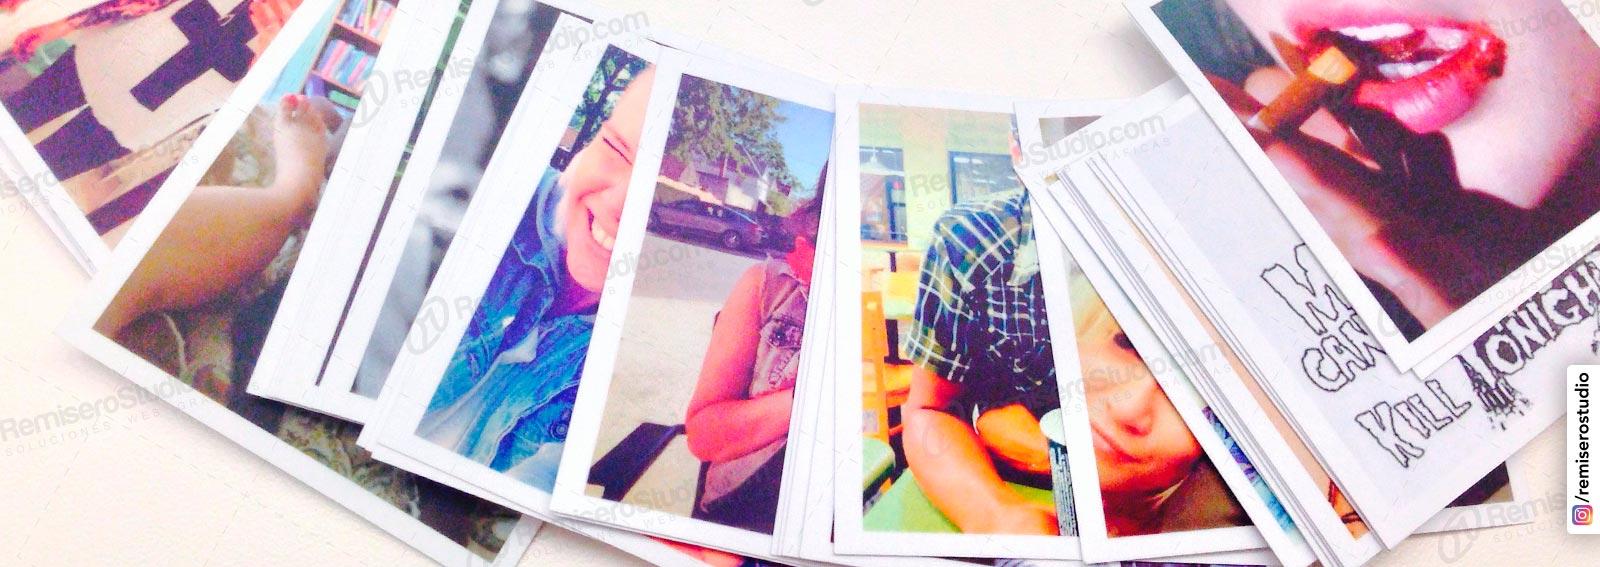 impresion de fotos digitales impresi n a color inkjet en lima per impresi n digital